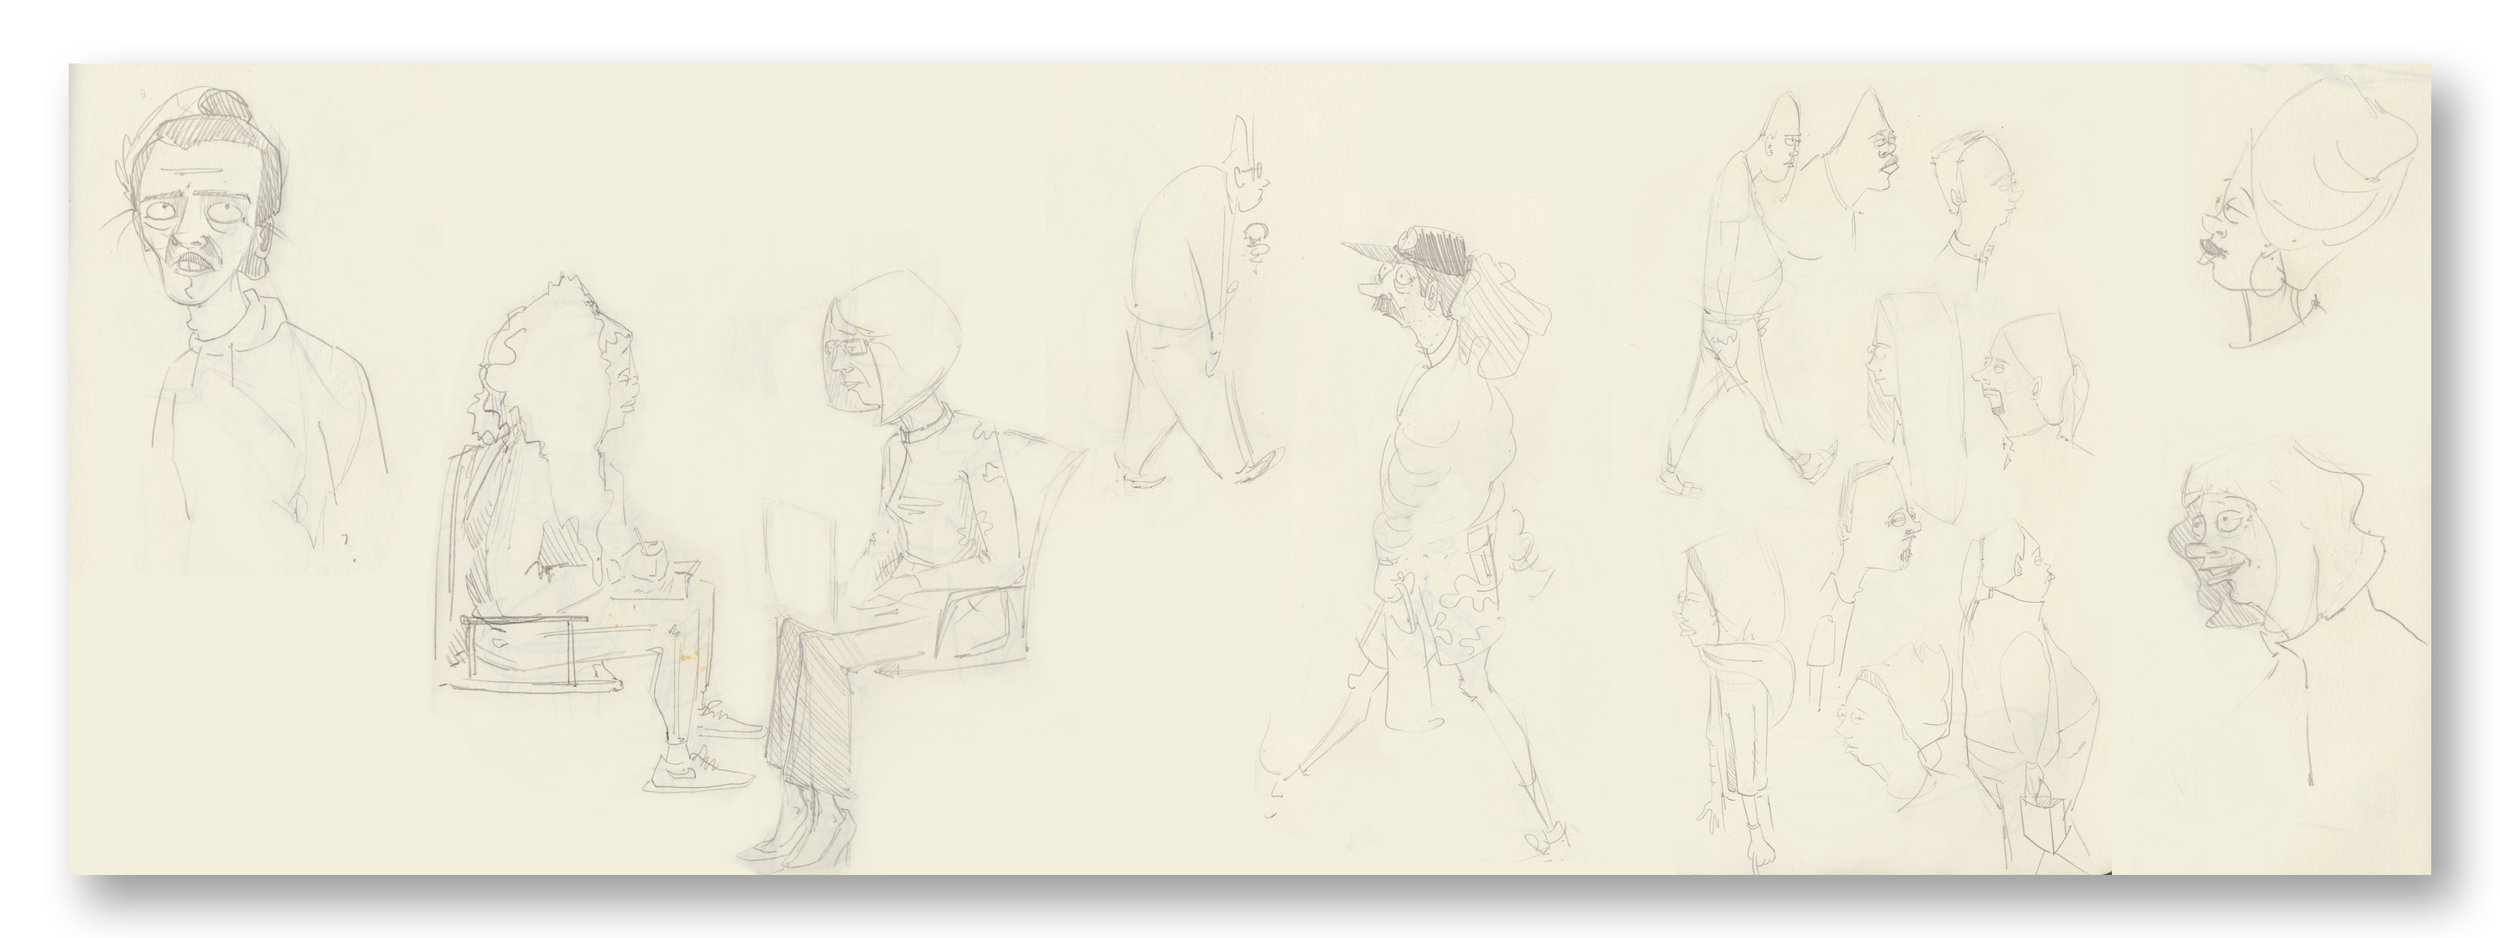 People Sketches  Pencil